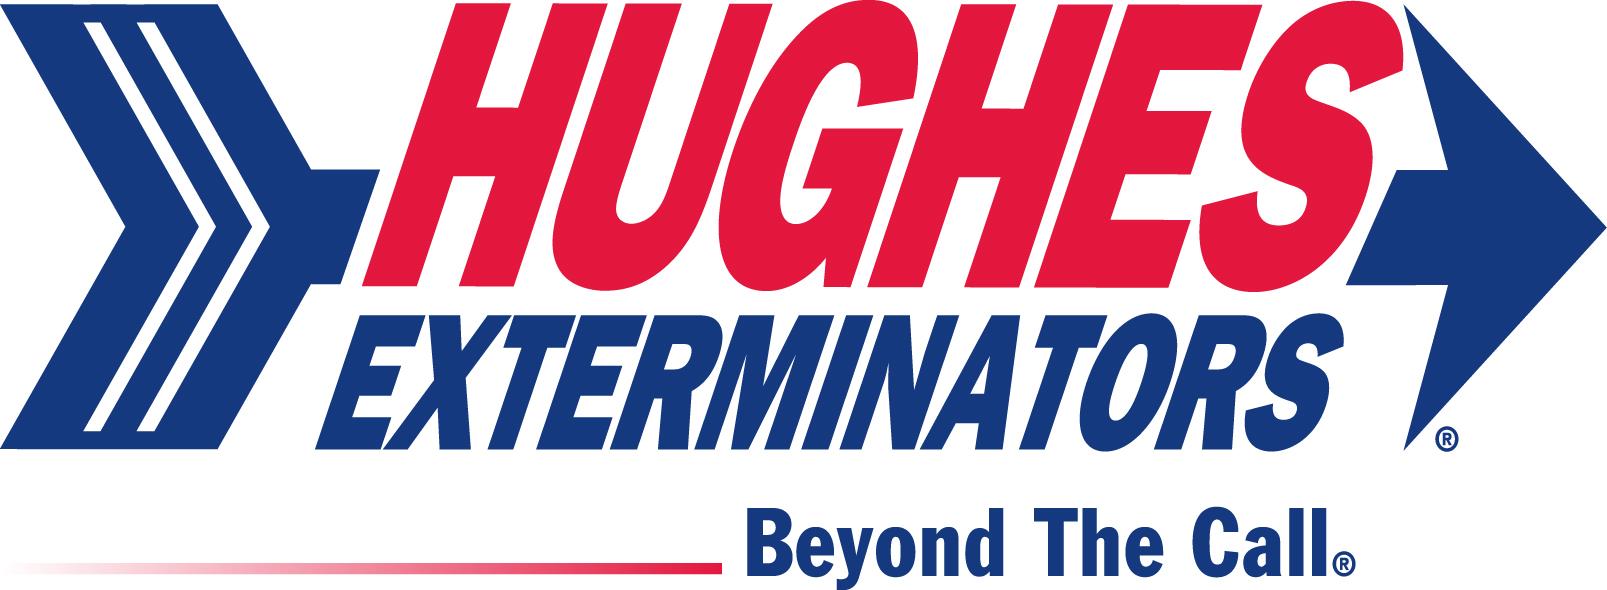 Hughes Exterminators Sarasota Fl 34231 Listen360